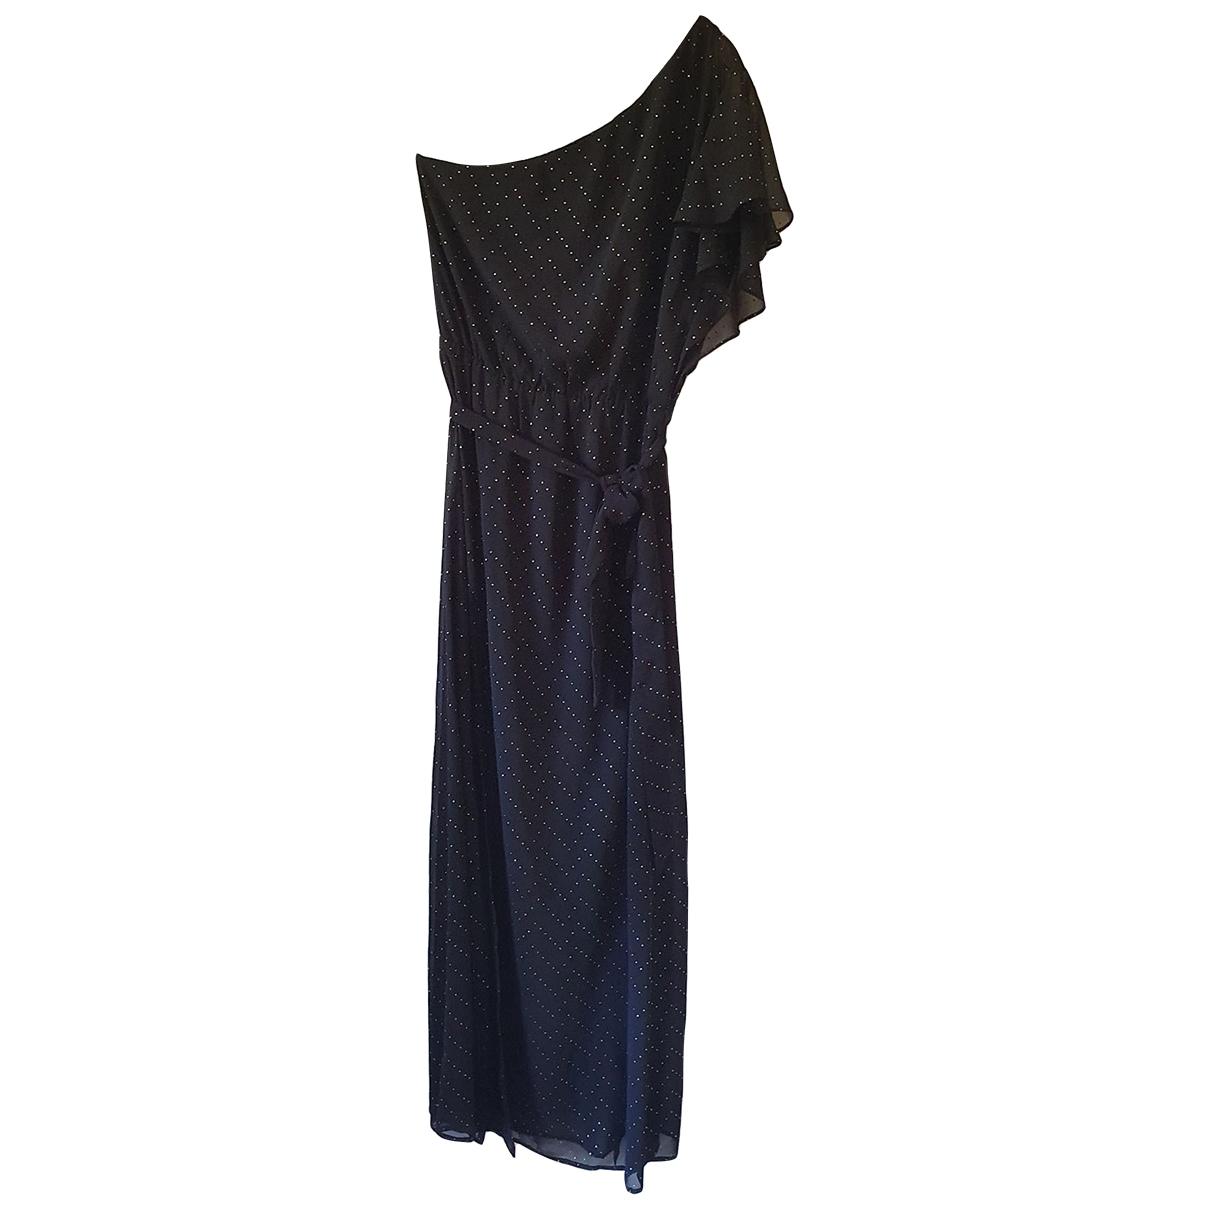 Maje Spring Summer 2019 Black dress for Women 2 US